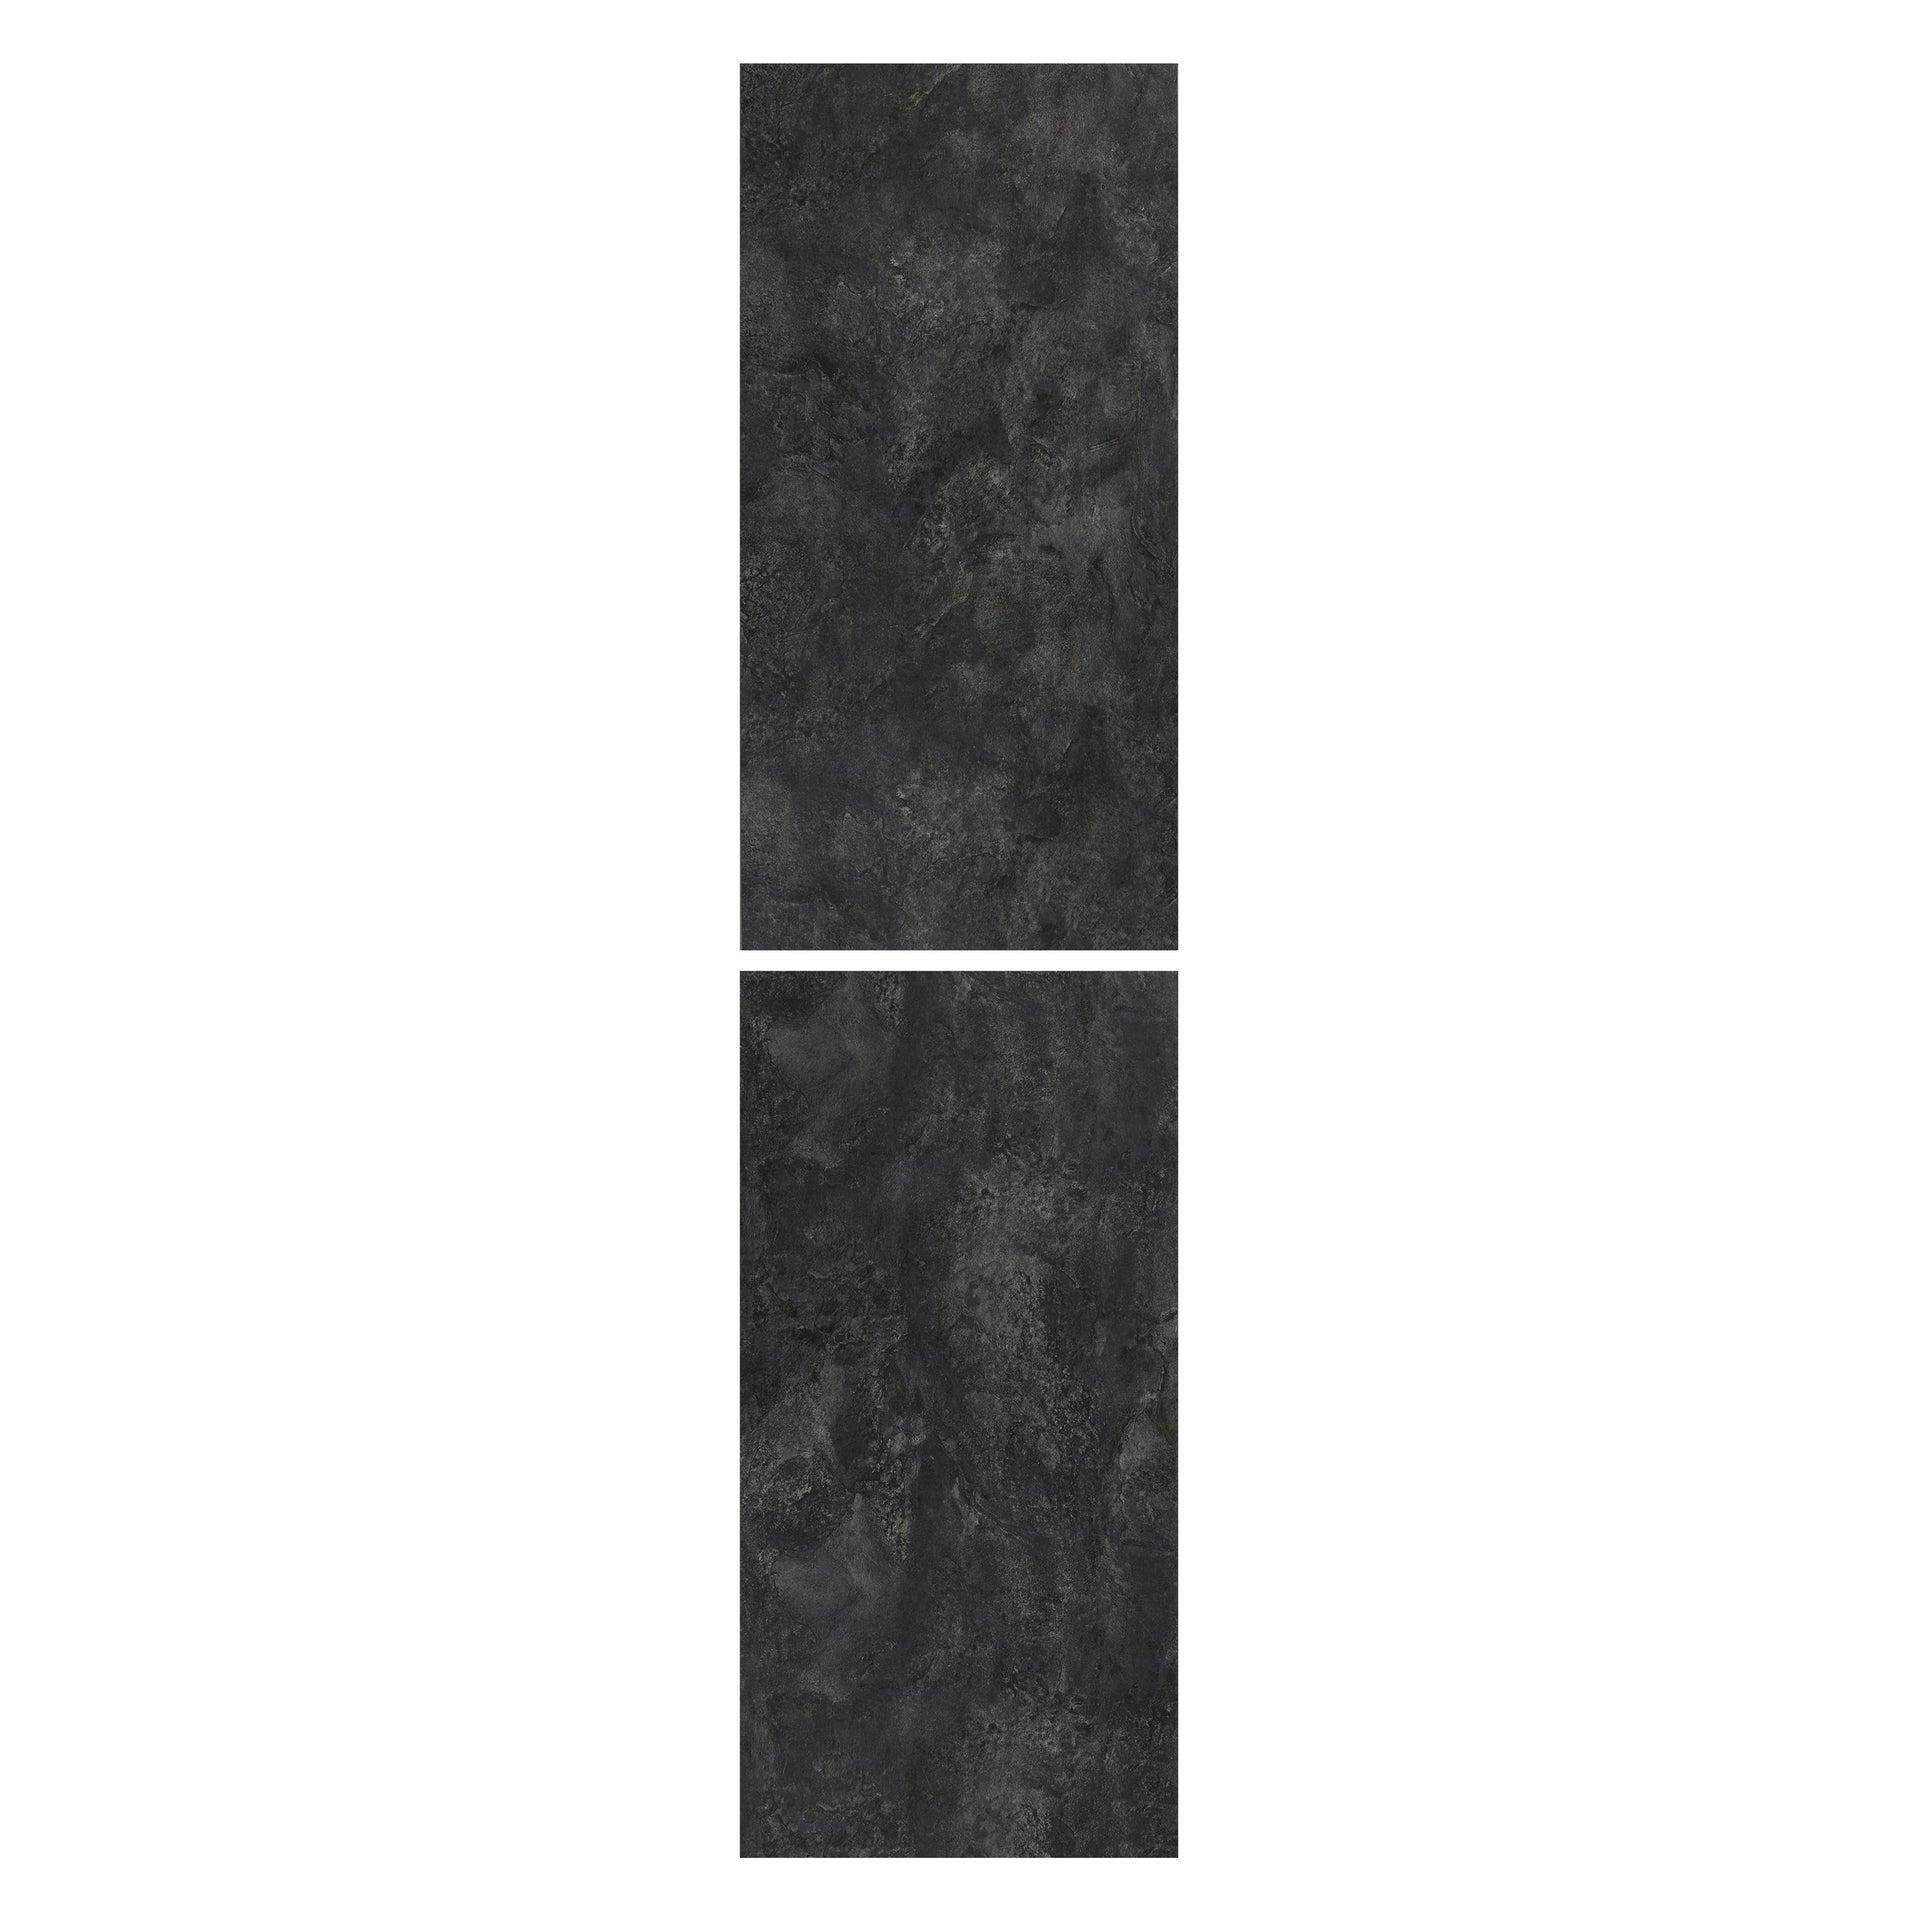 Pavimento PVC flottante clic+ Slate Sp 5 mm nero - 2